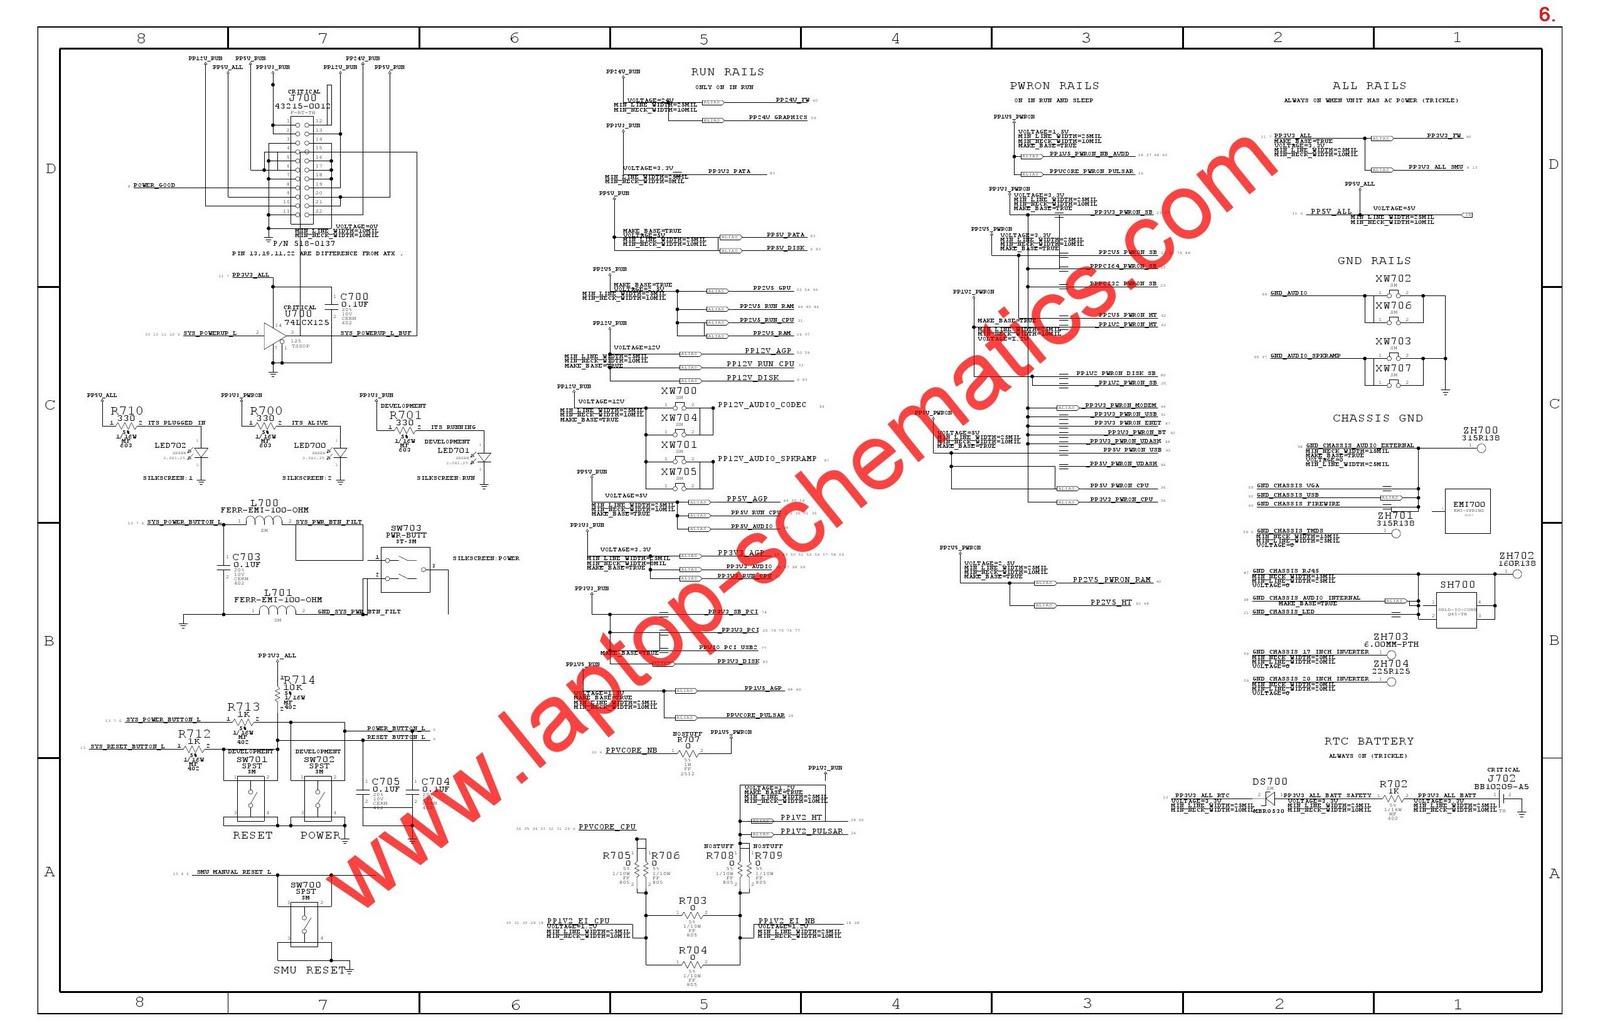 (skema) : APPLE laptop schematic diagram